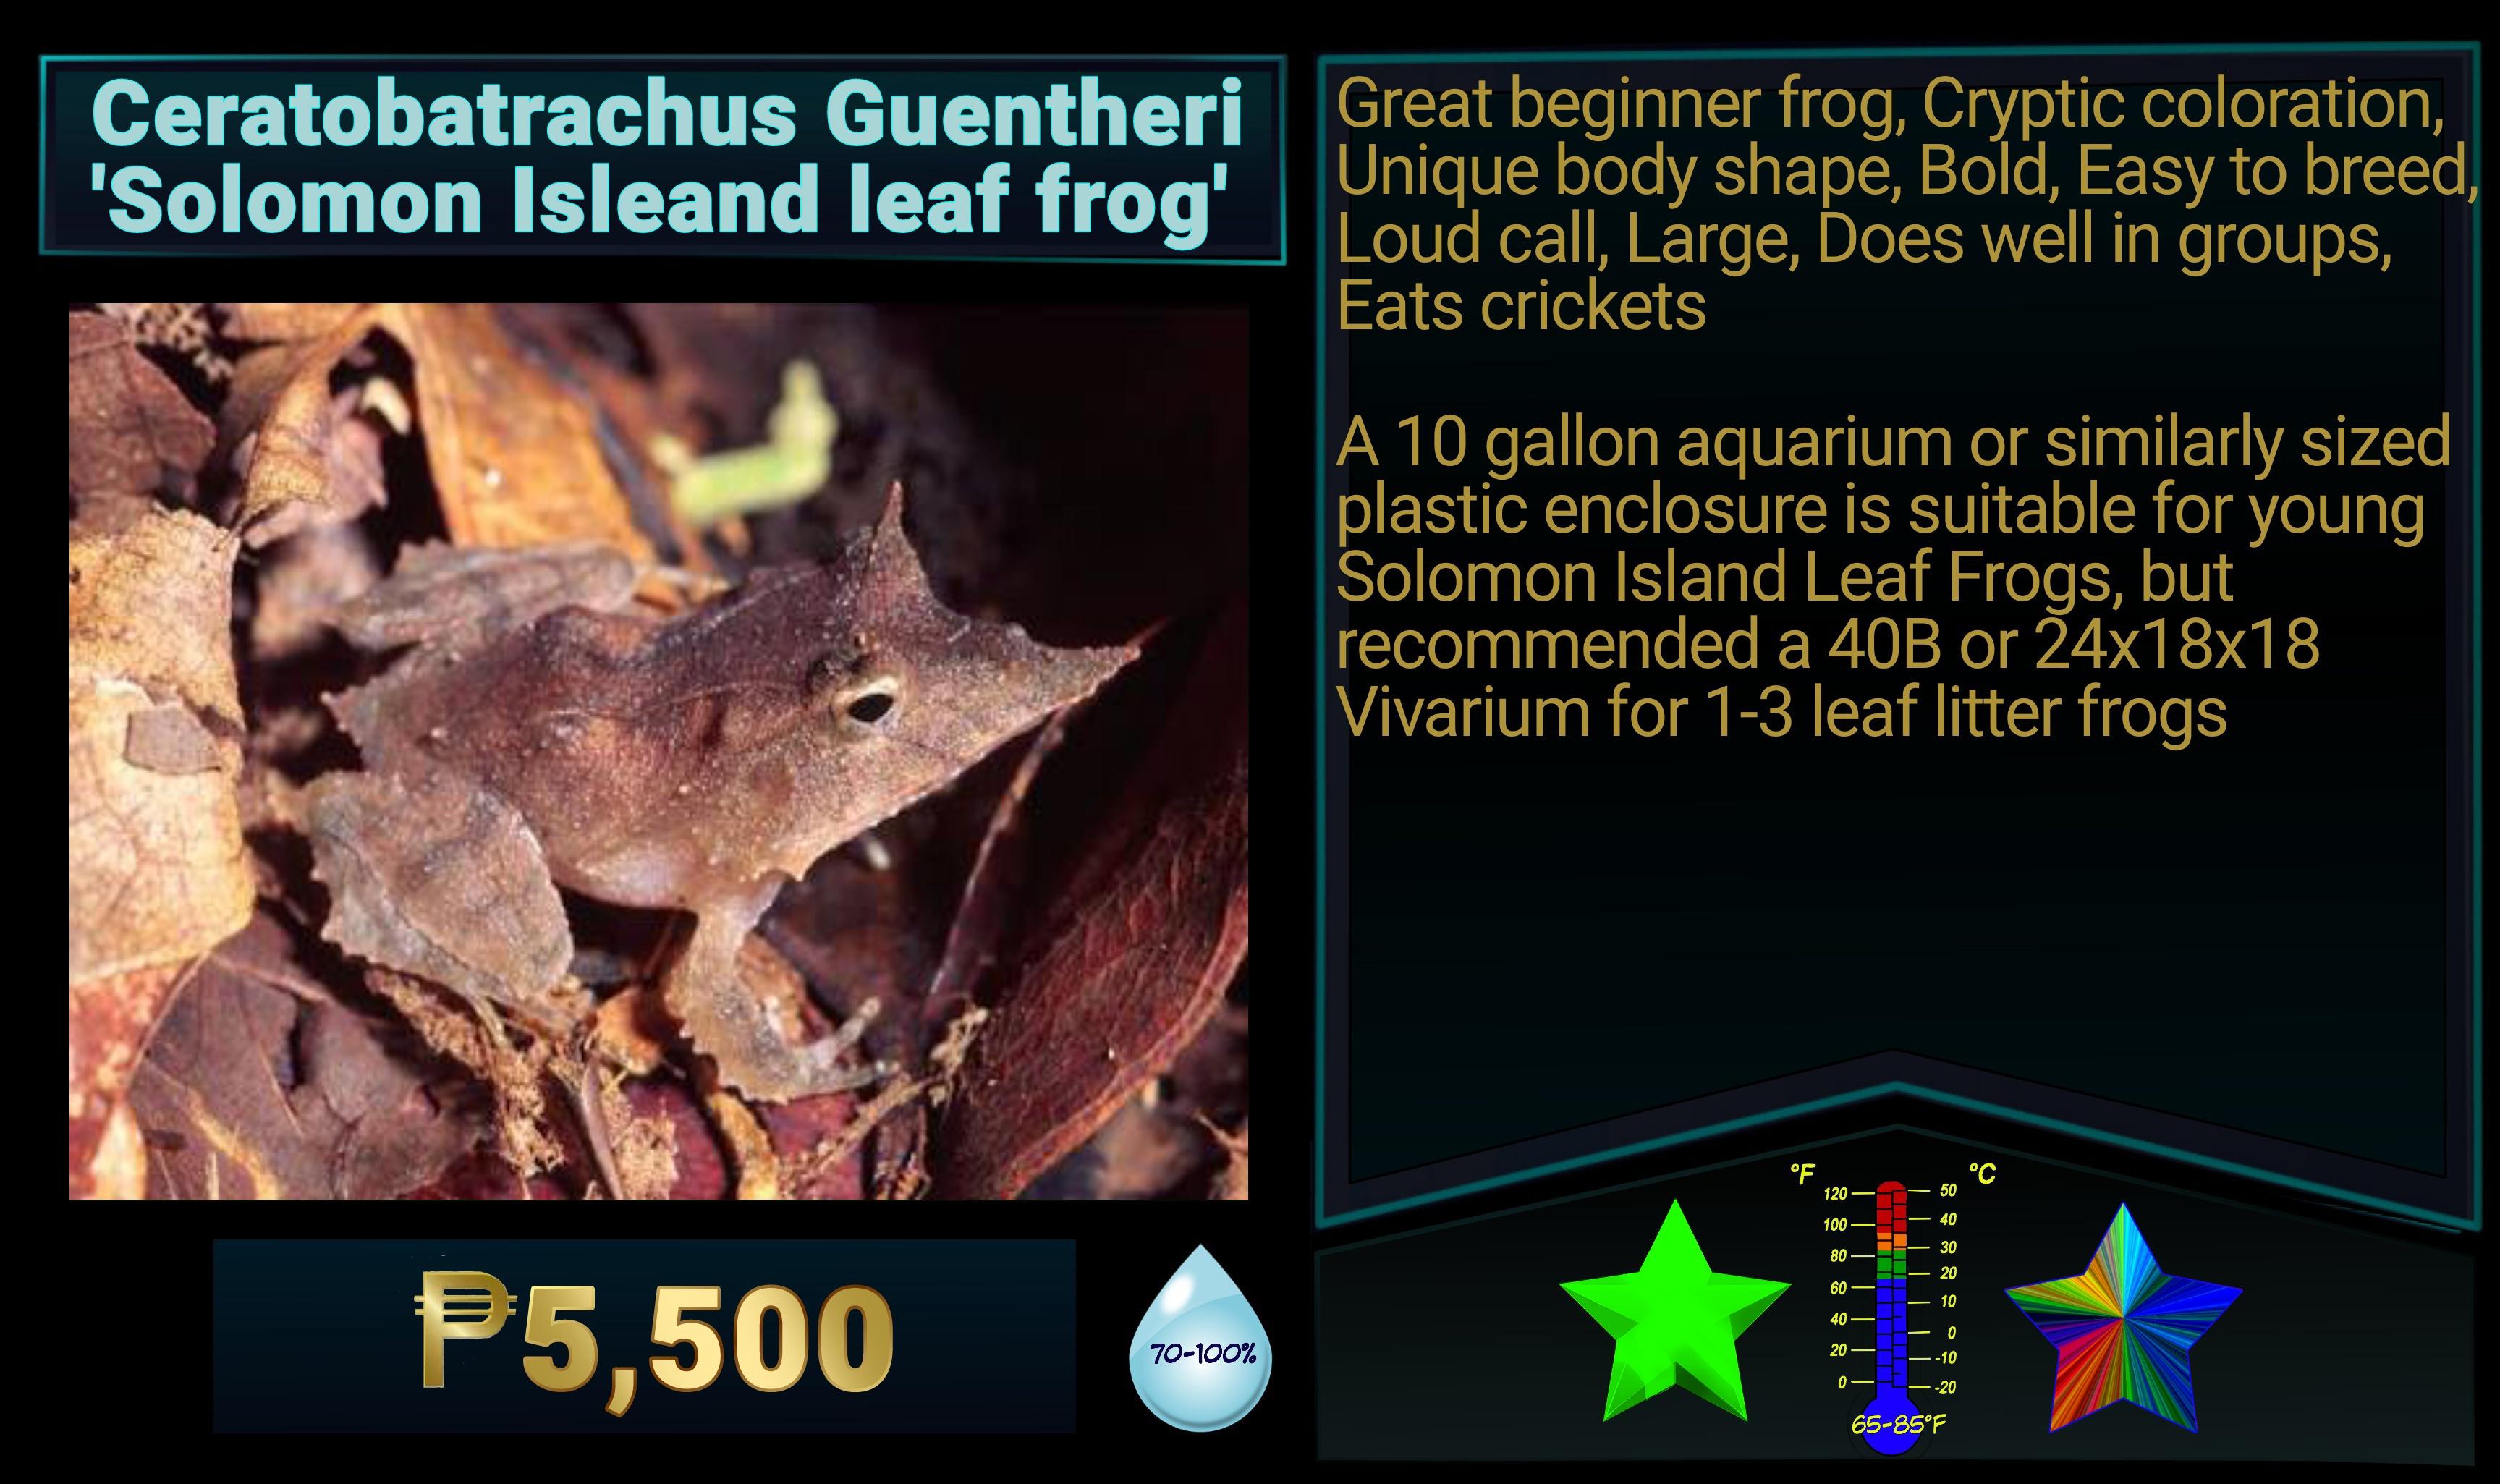 Ceratobatrachus guentheri SolomonIsland Leaf Frog